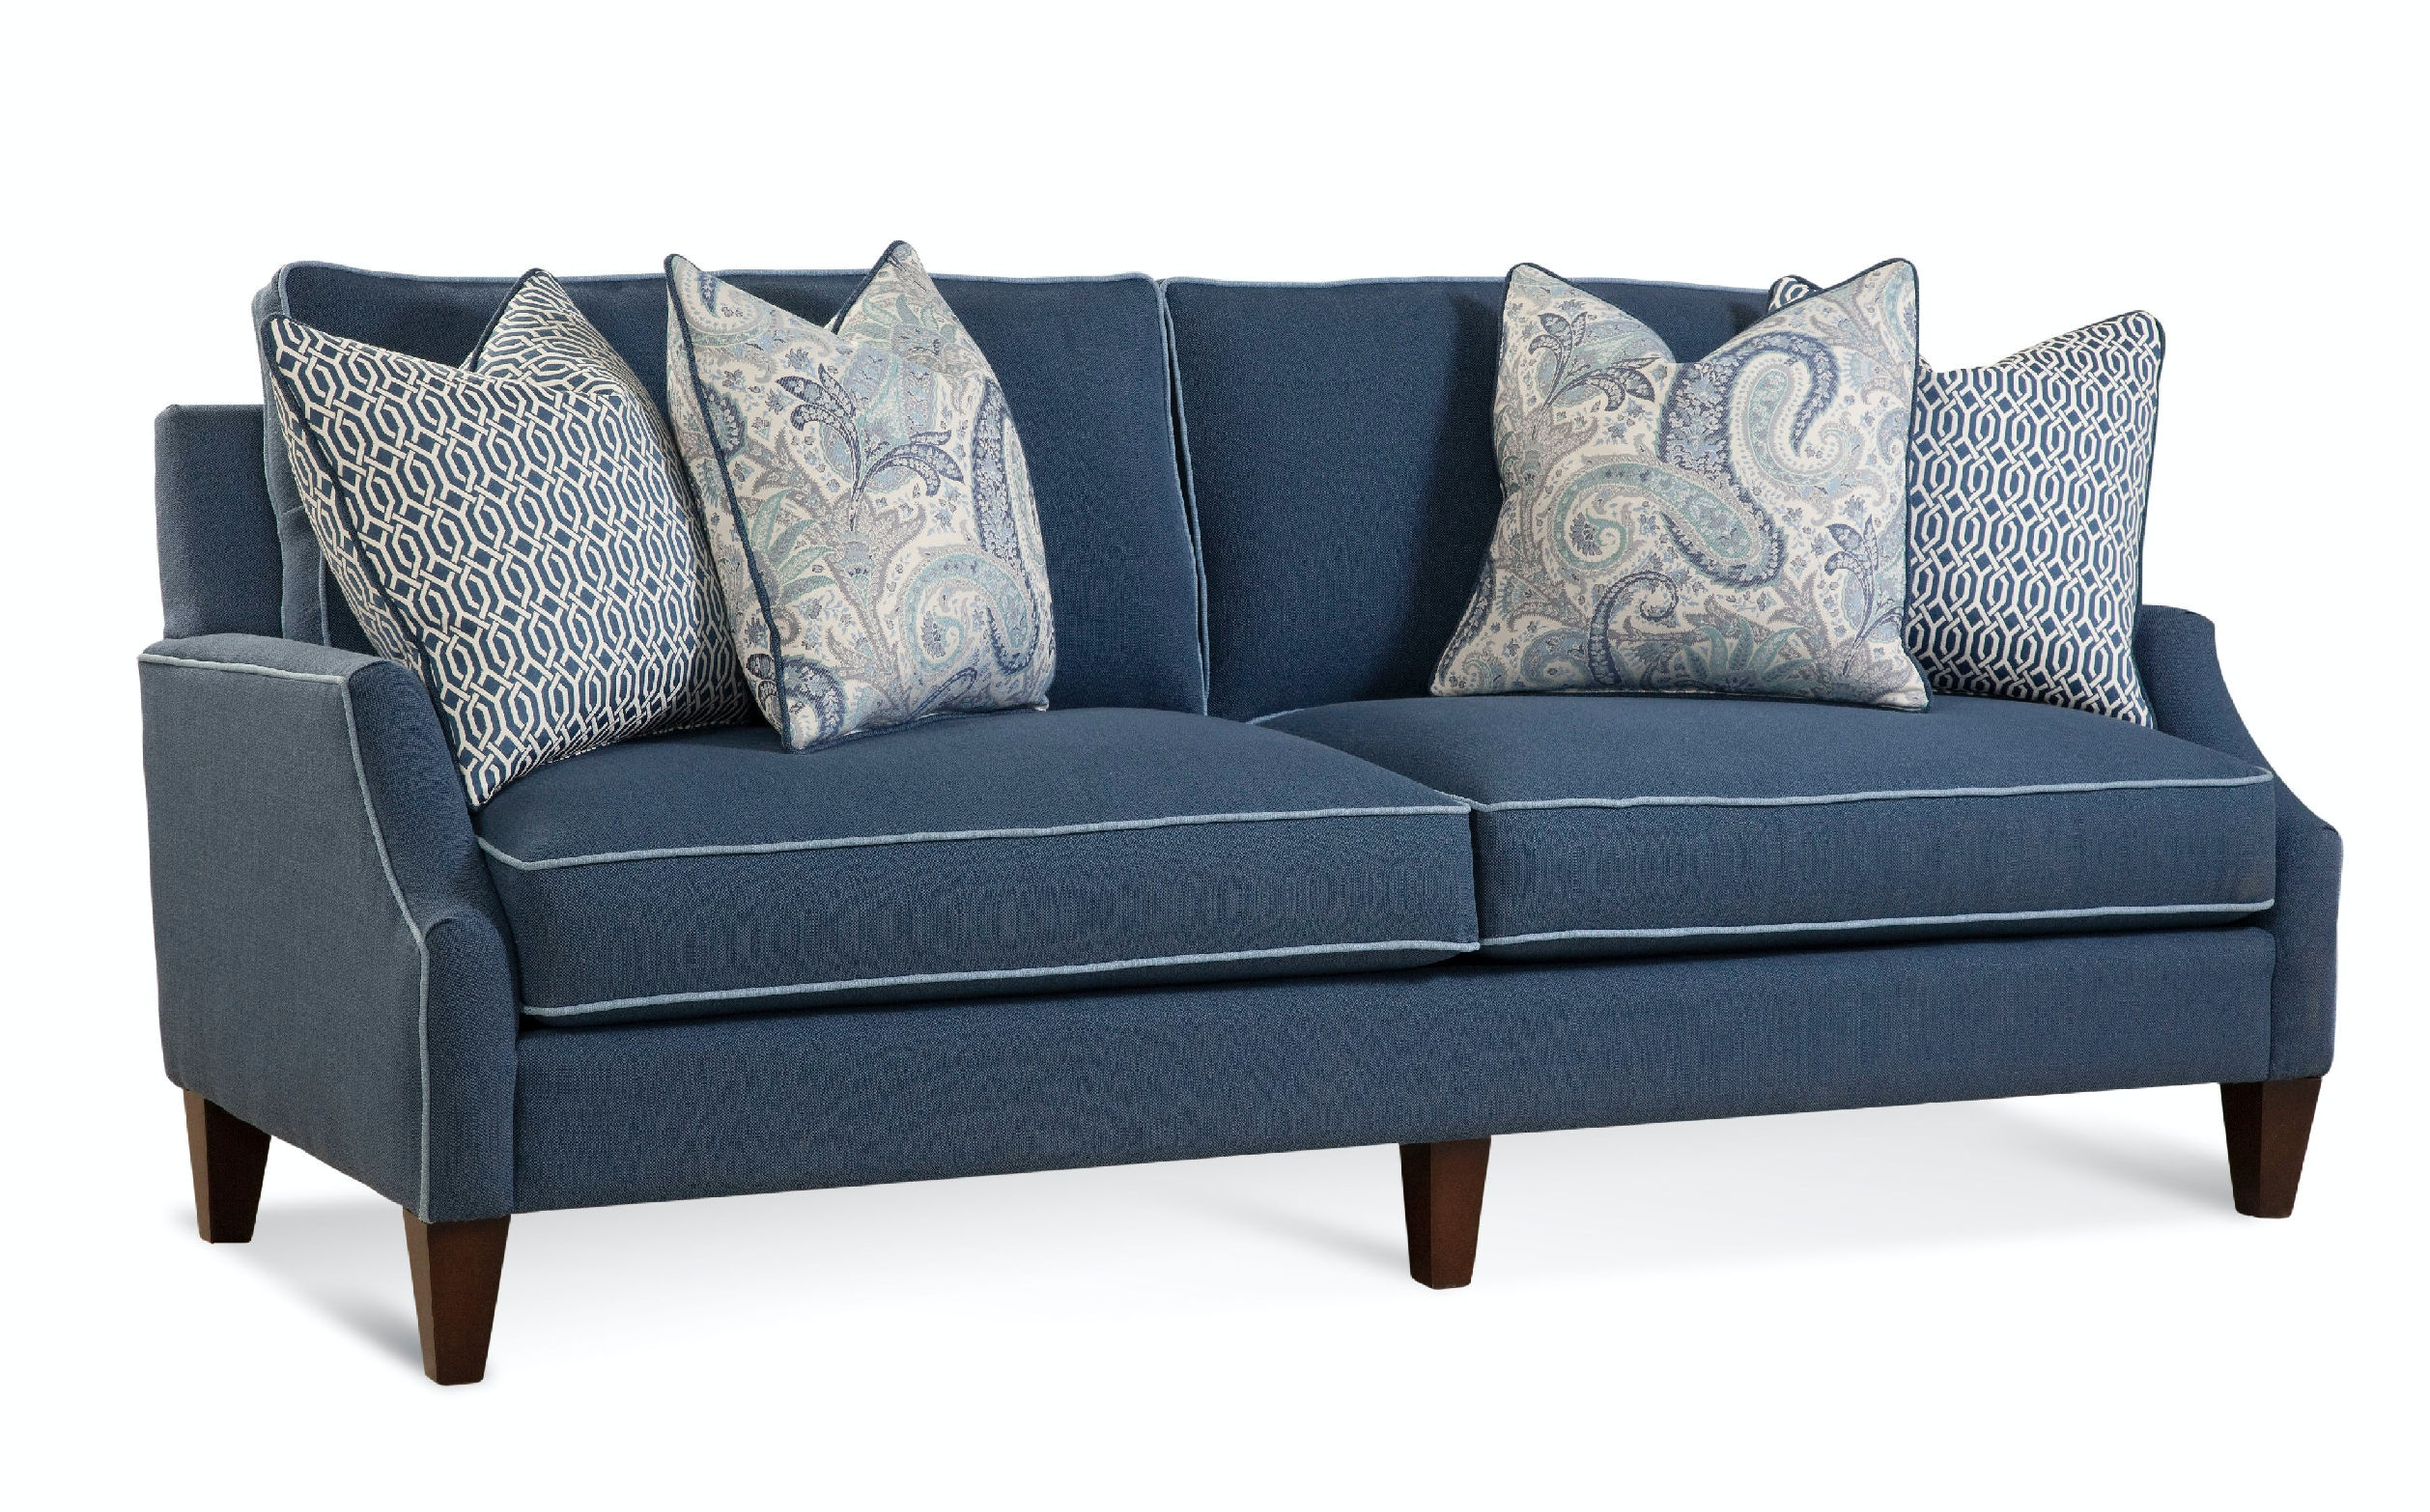 Braxton Culler Sofa A712 0112